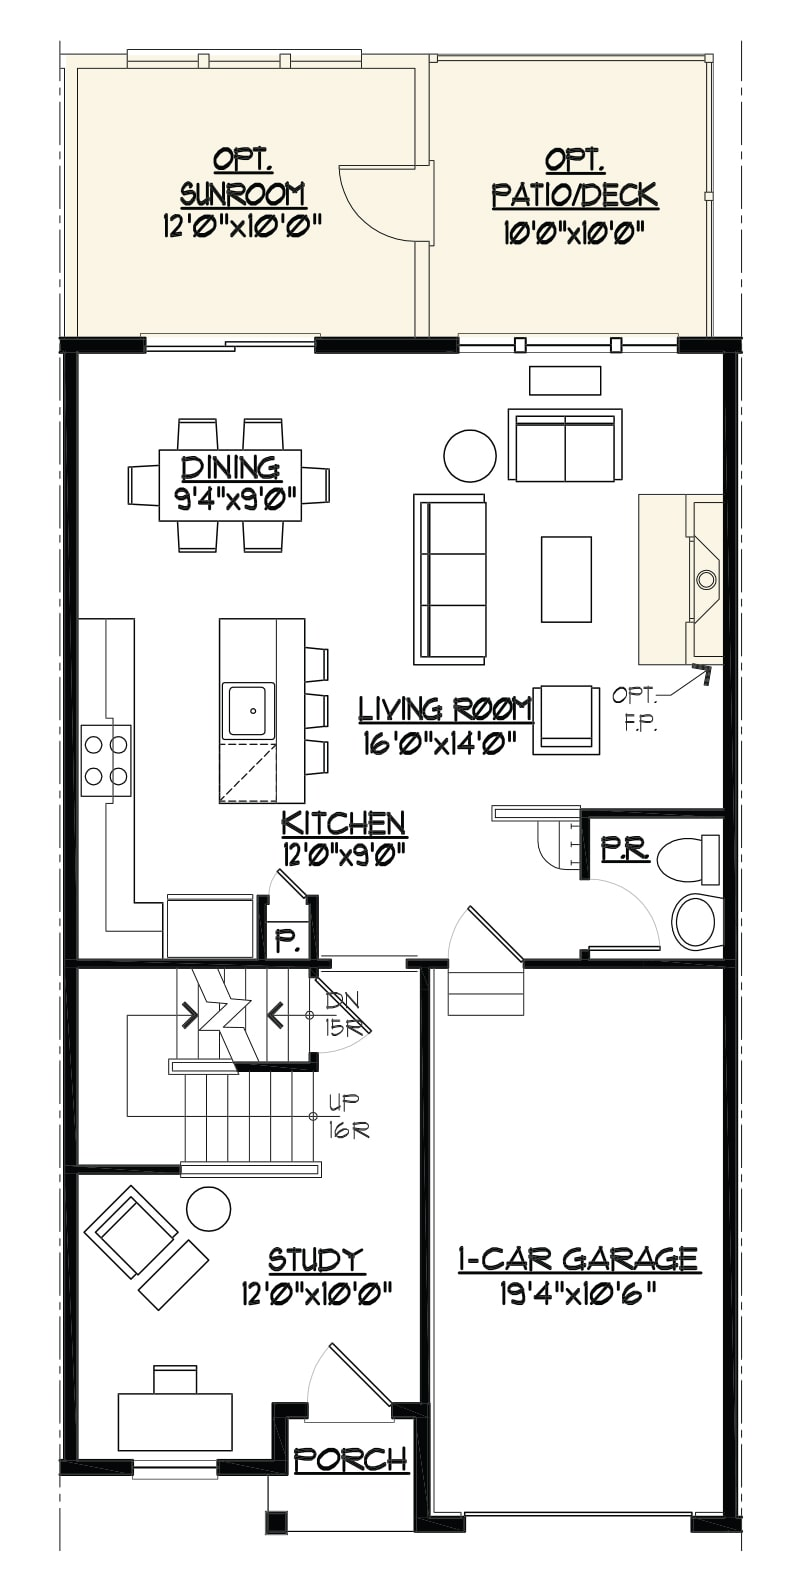 Image of the Jamestown townhome living room area floor plan.